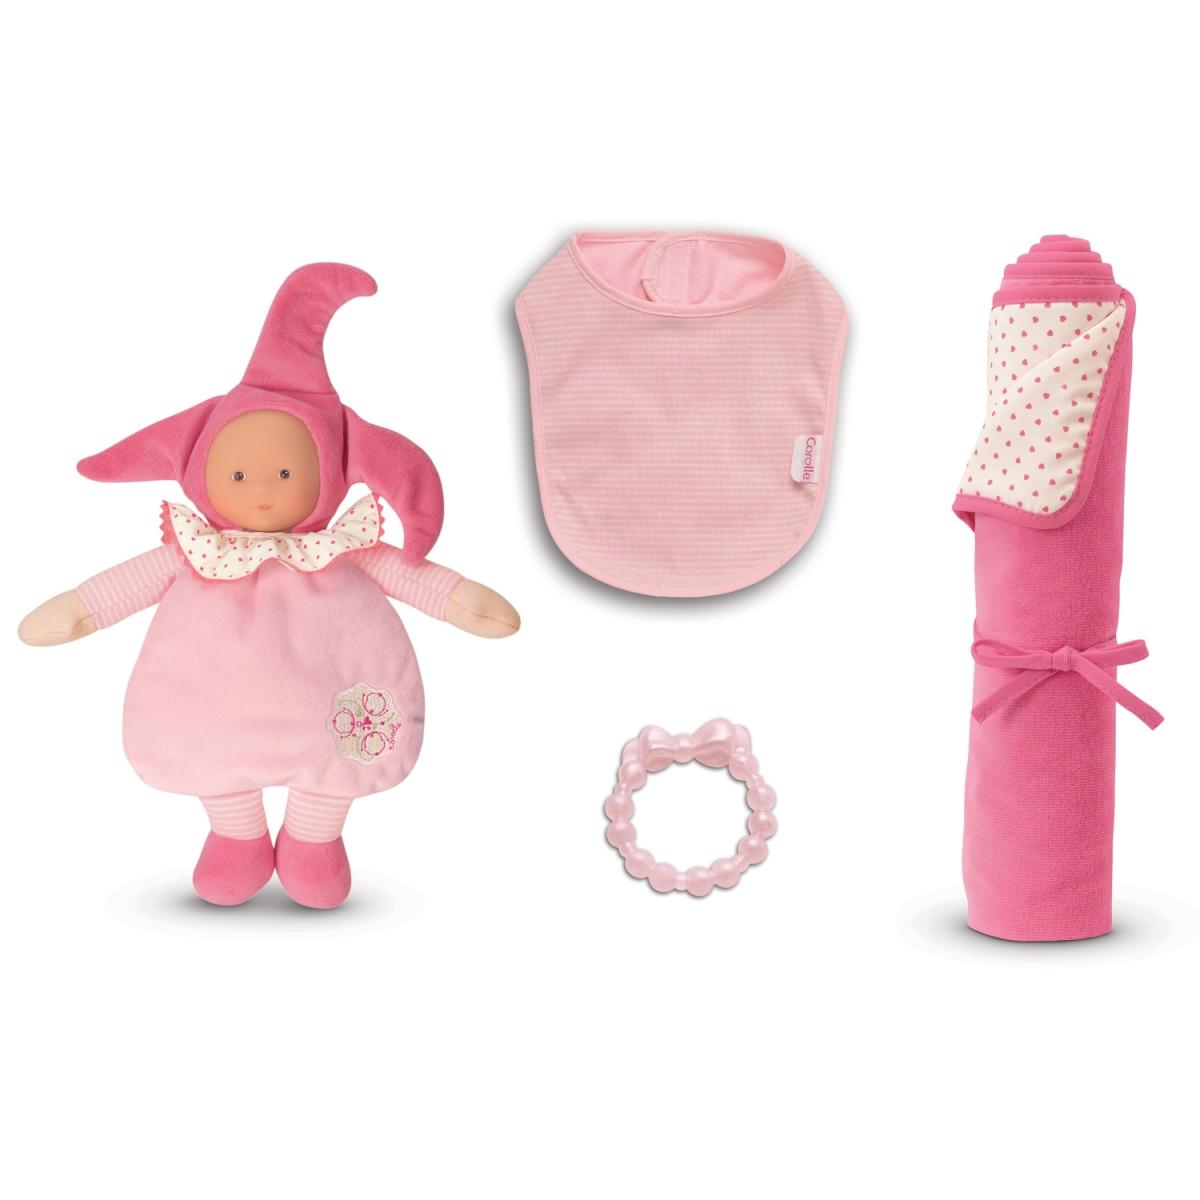 Birth Set with Pink Elf